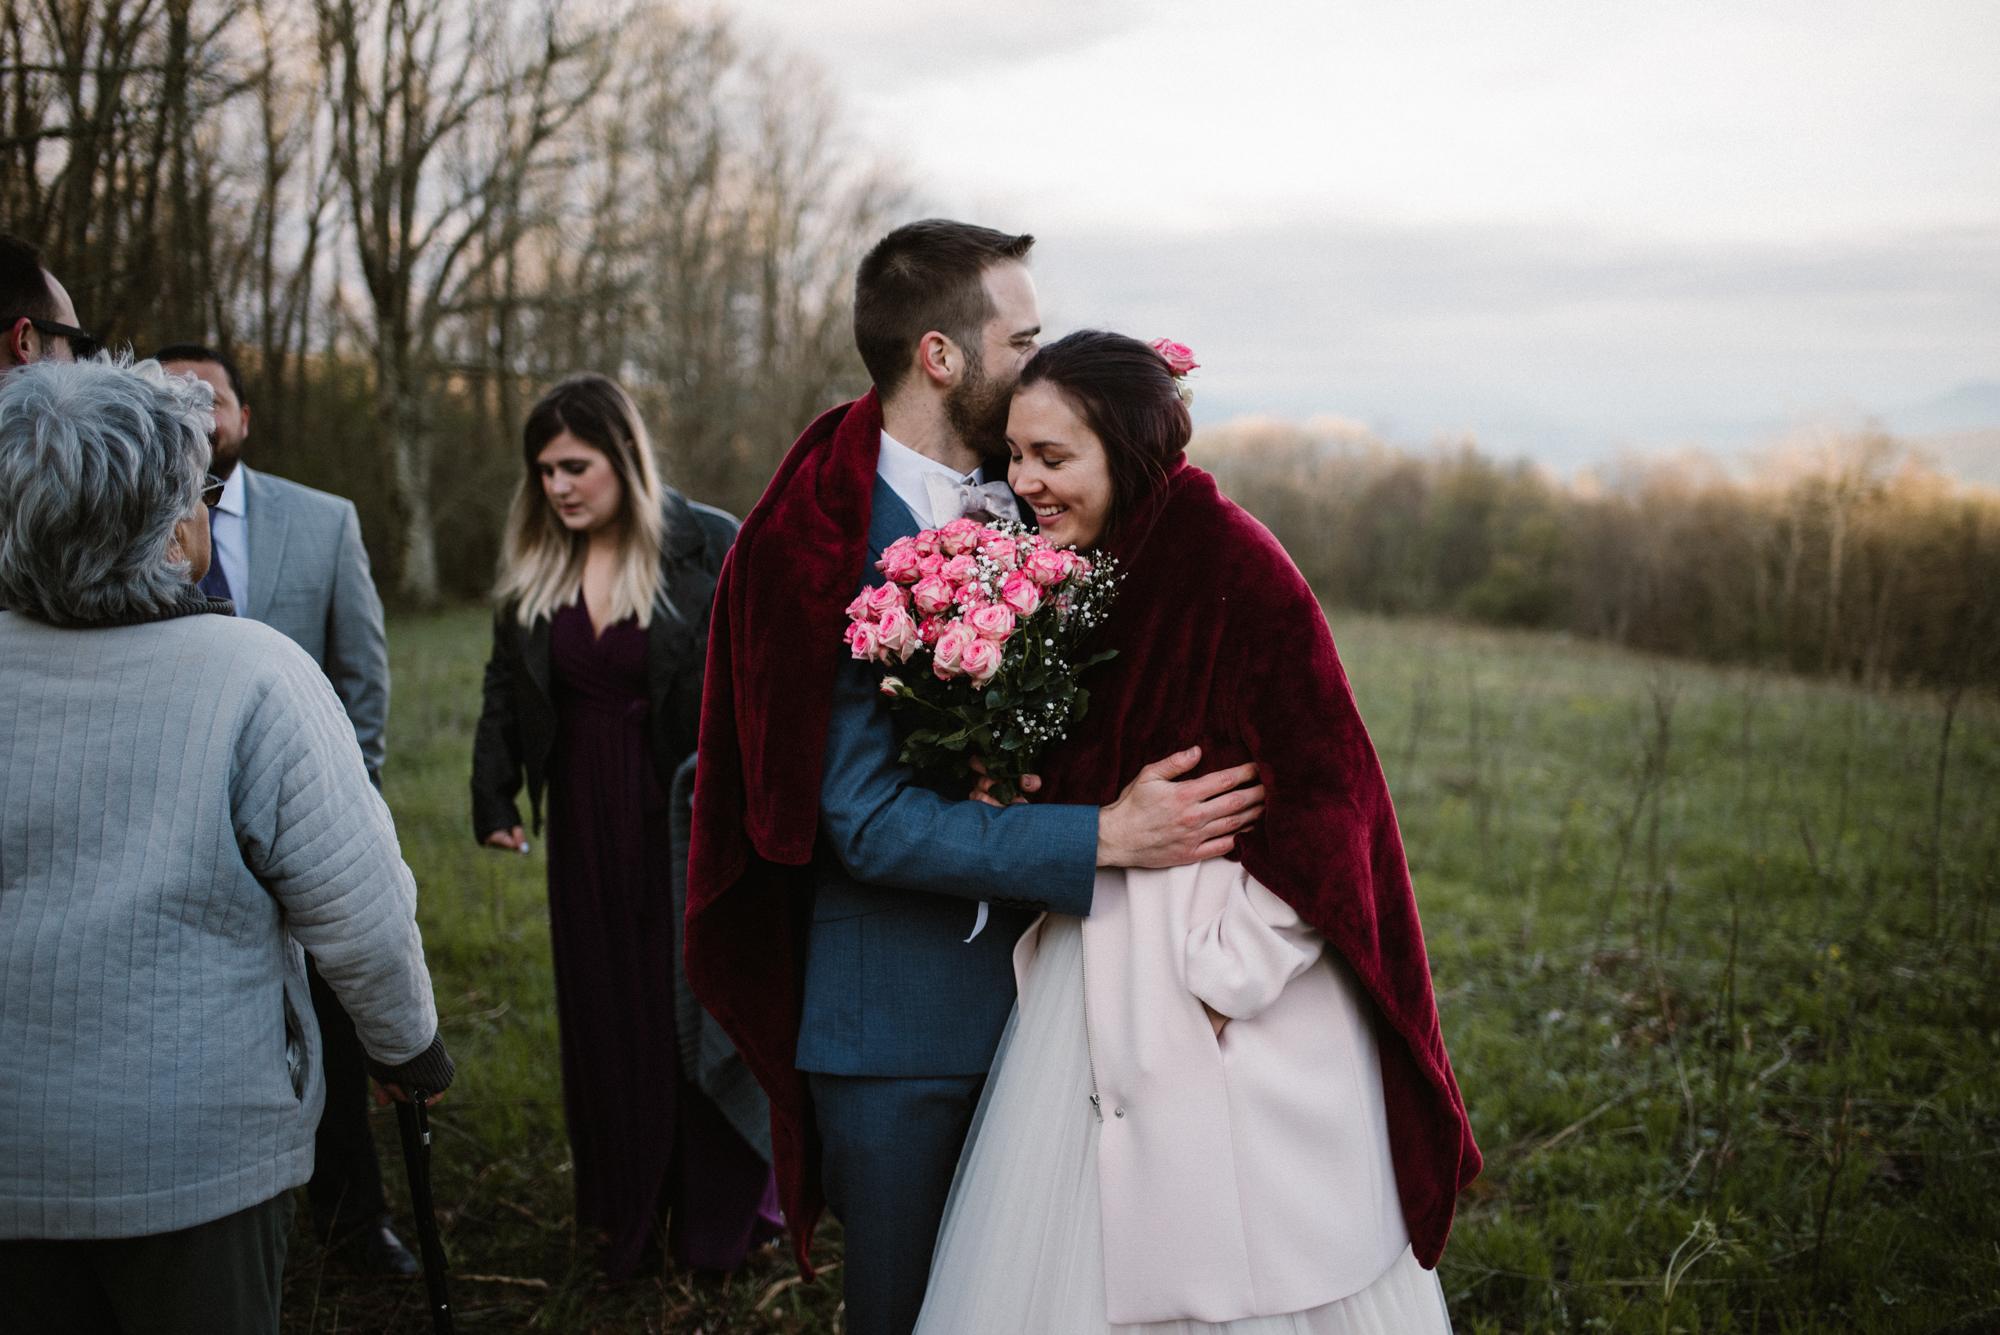 Paula and Andrew - Small Adventurous Wedding in Shenandoah National Park - Blue Ridge Mountain Wedding - White Sails Creative - Mountain Elopement_27.jpg